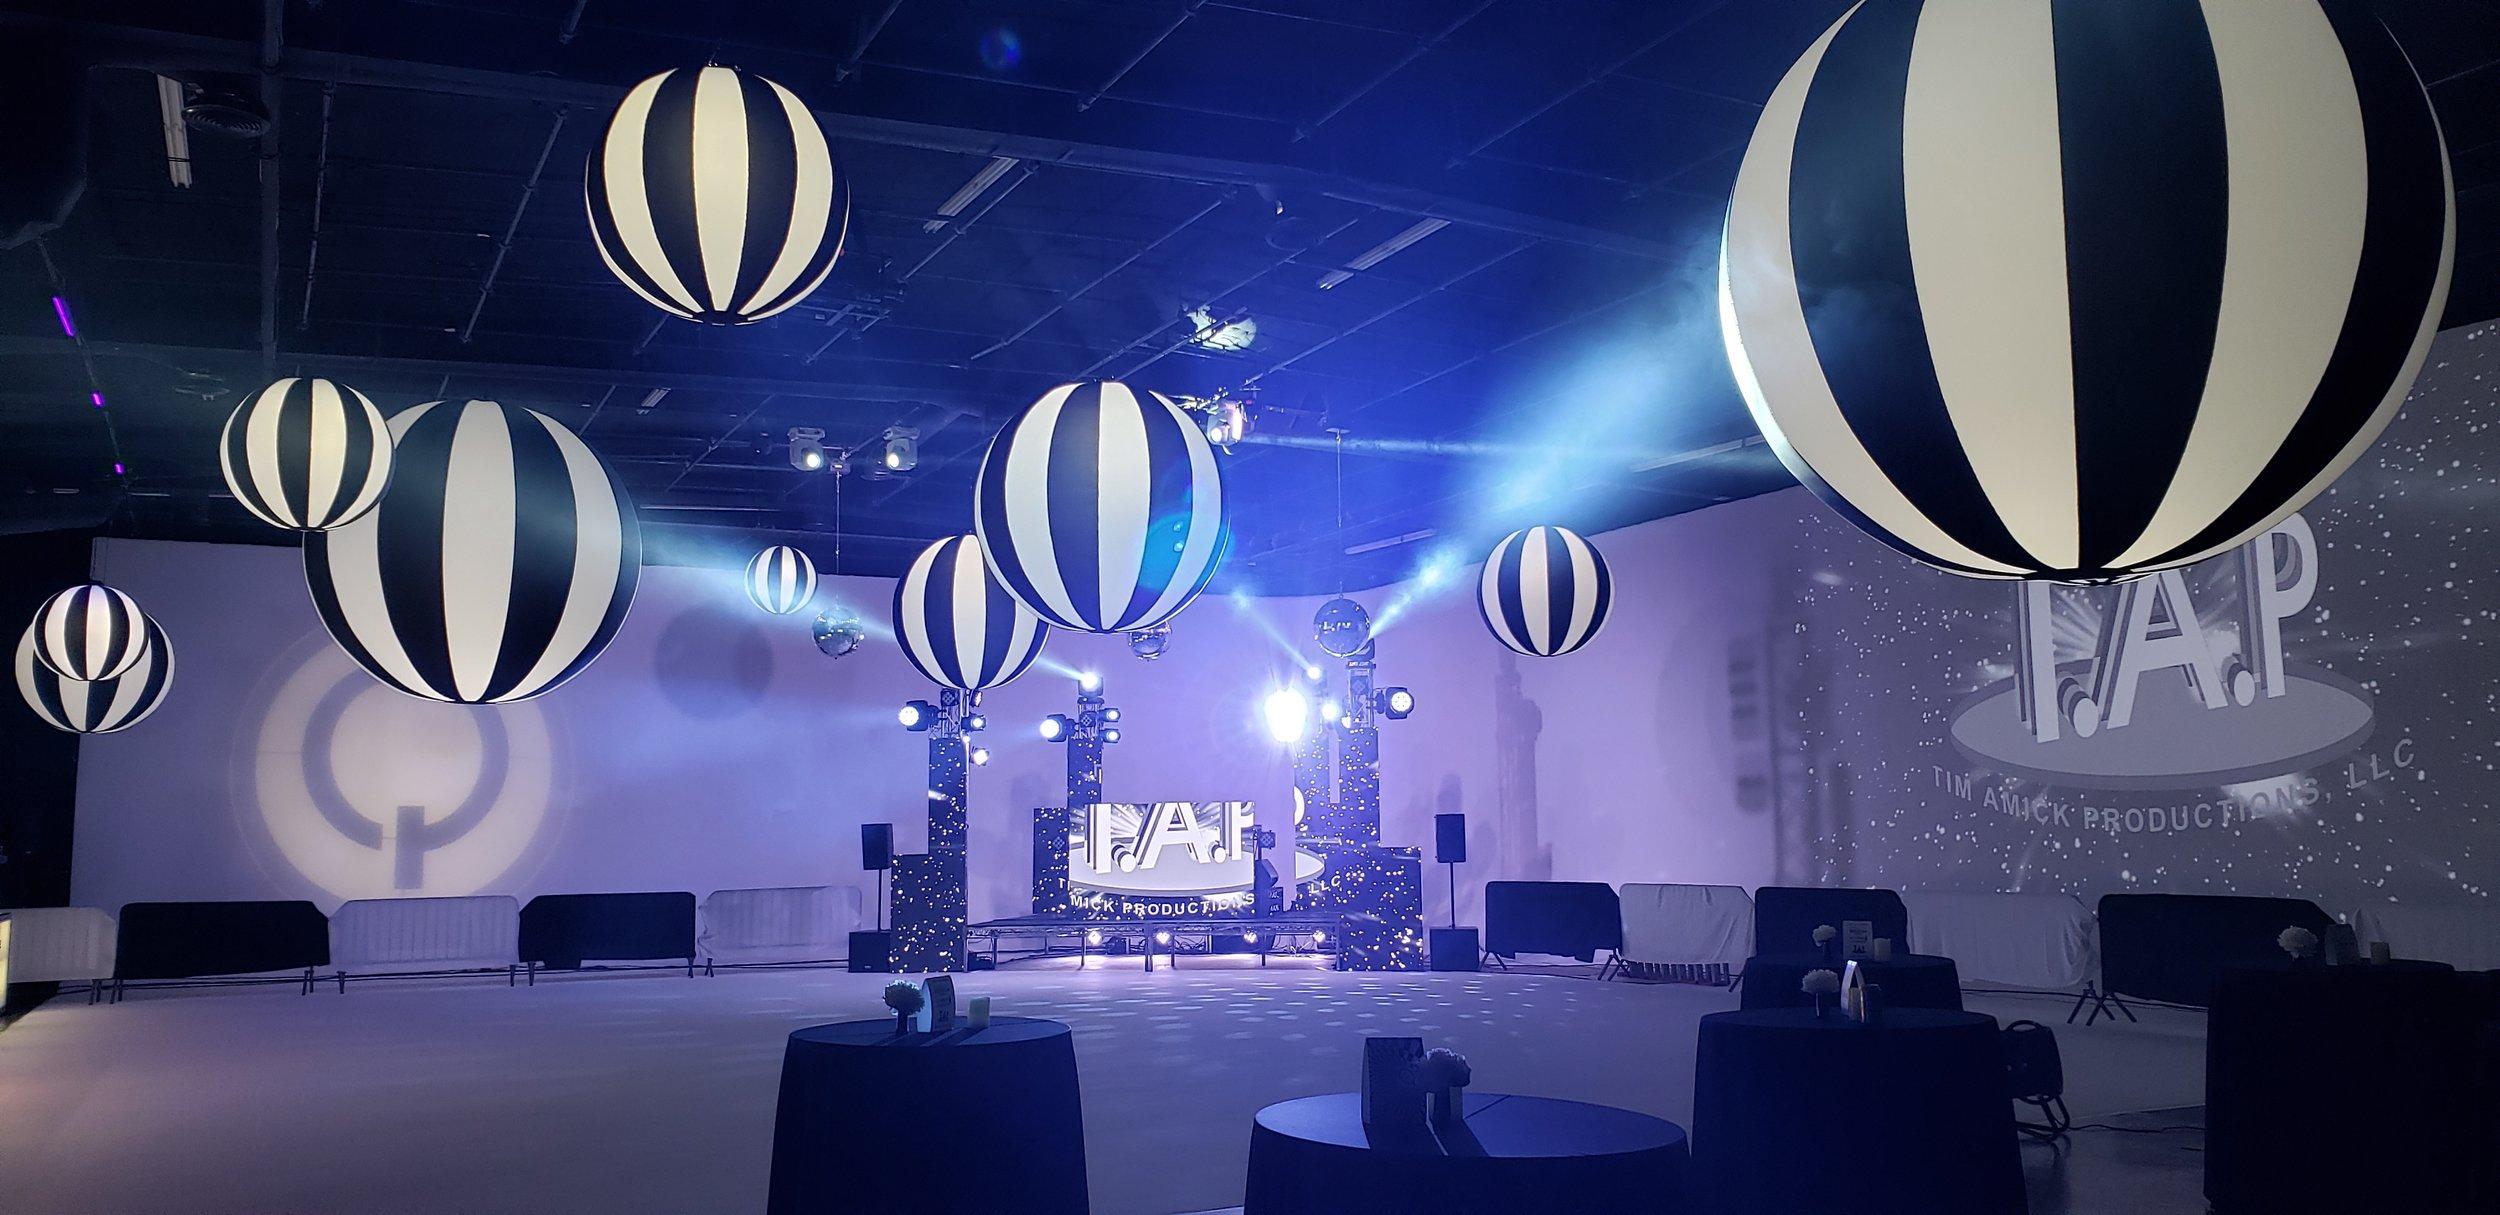 Black Tie Sphere Hi-Lights over a Dark lit Stage